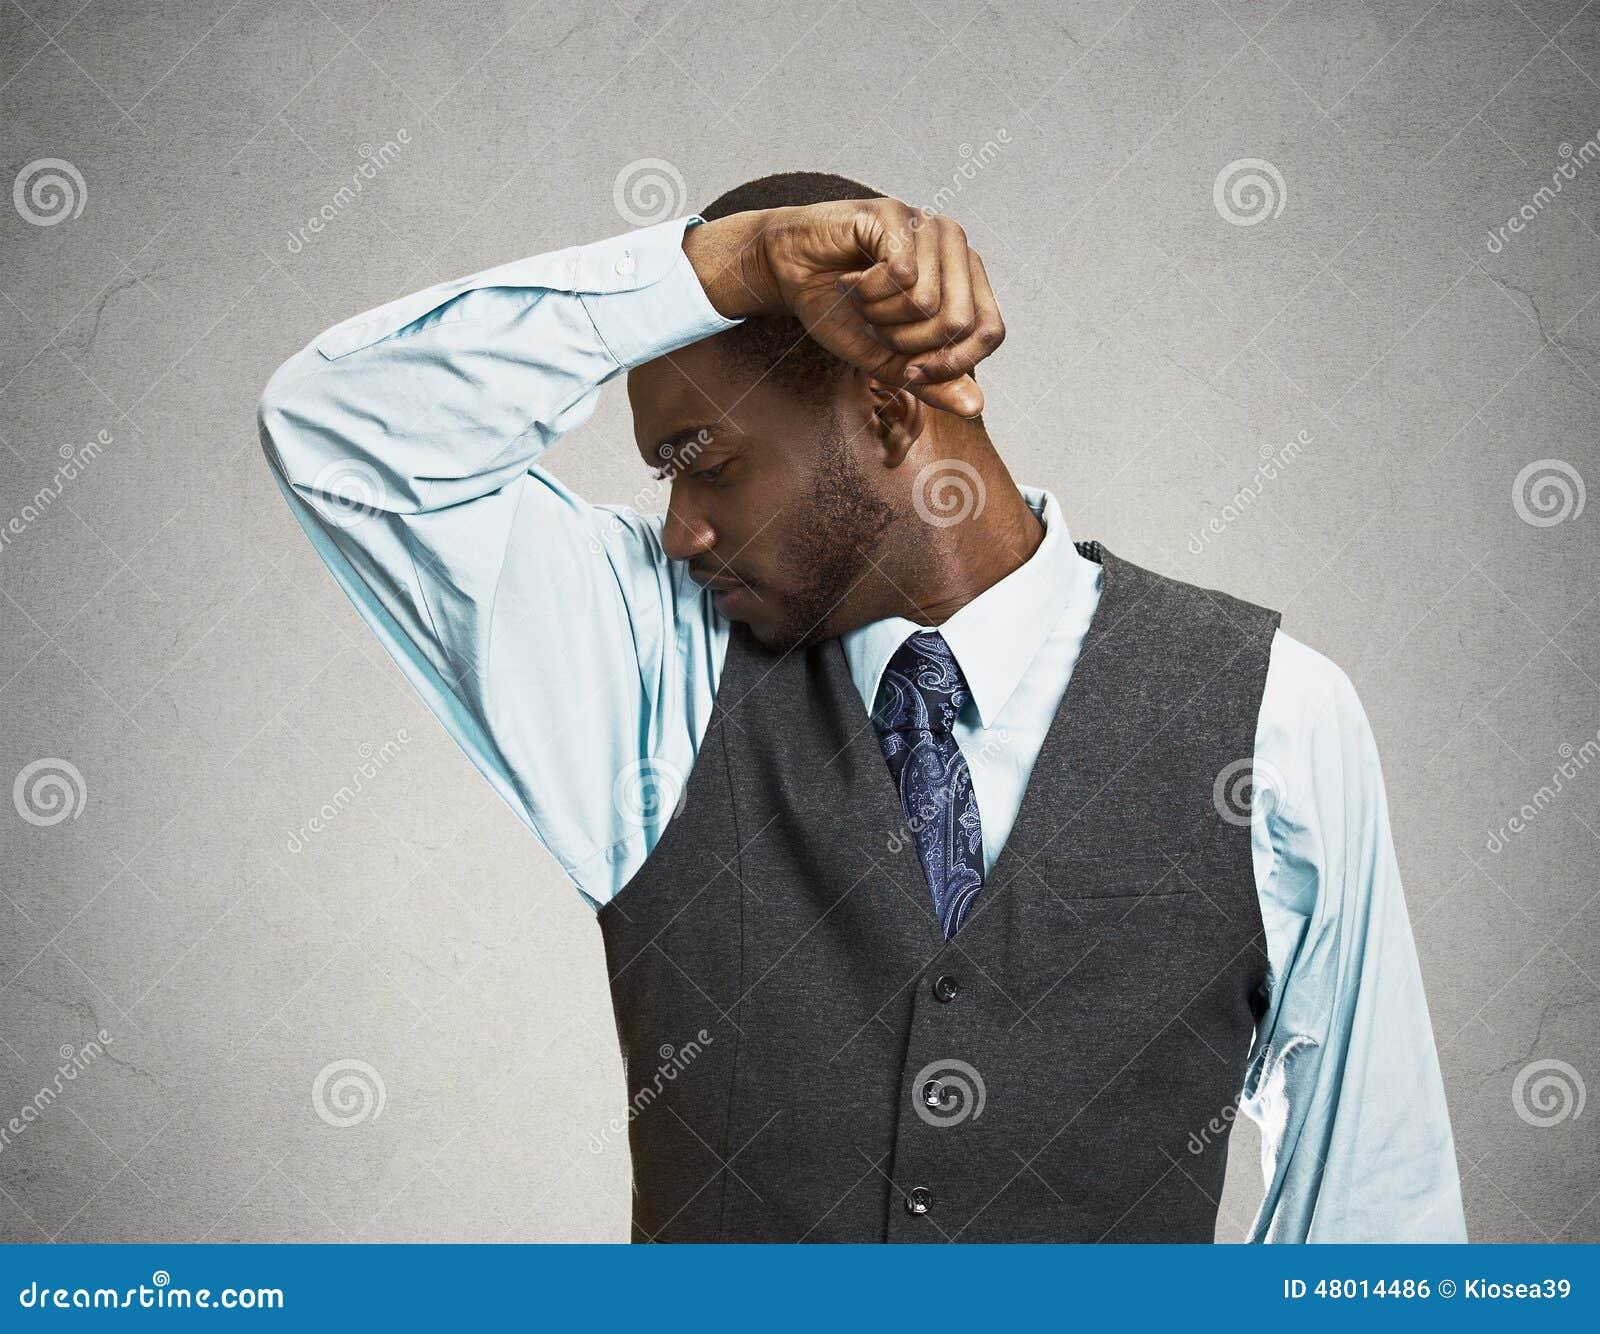 Man smells his armpit, bad odor